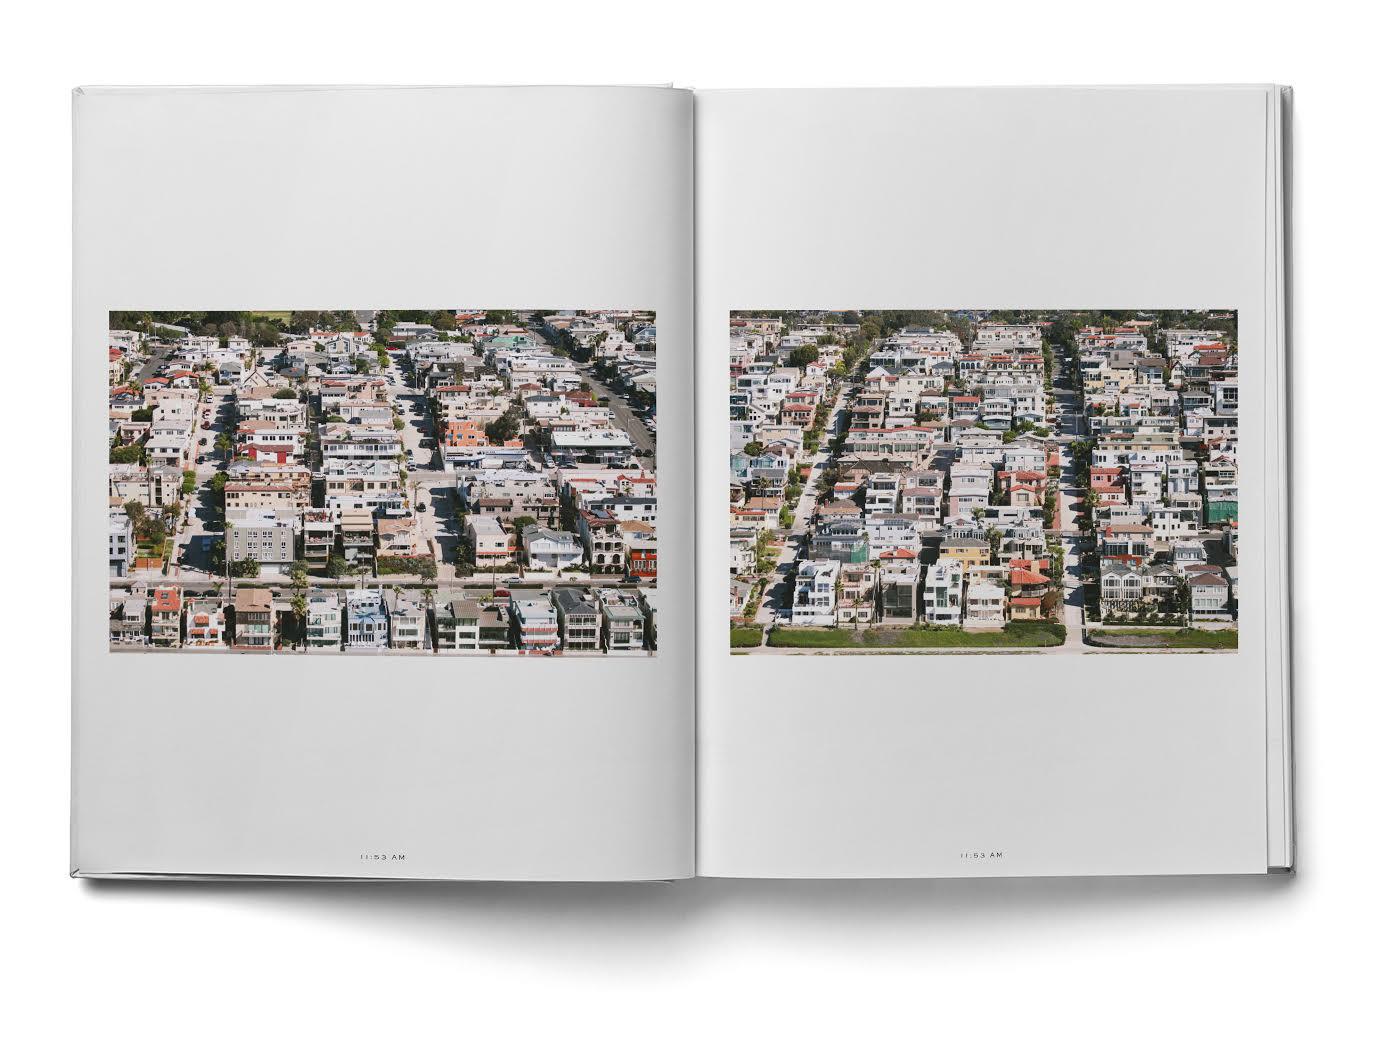 karlhab-24hlosangeles-book-3